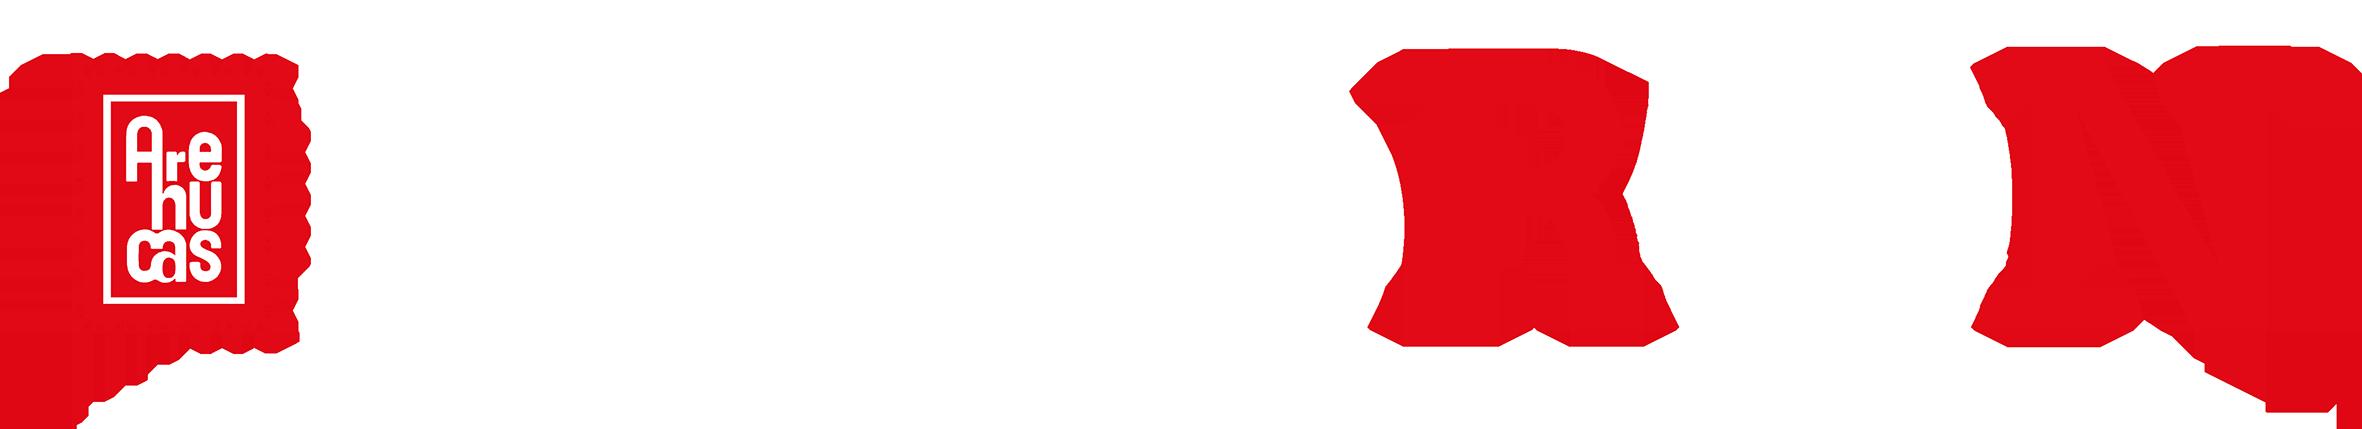 Fiestoron